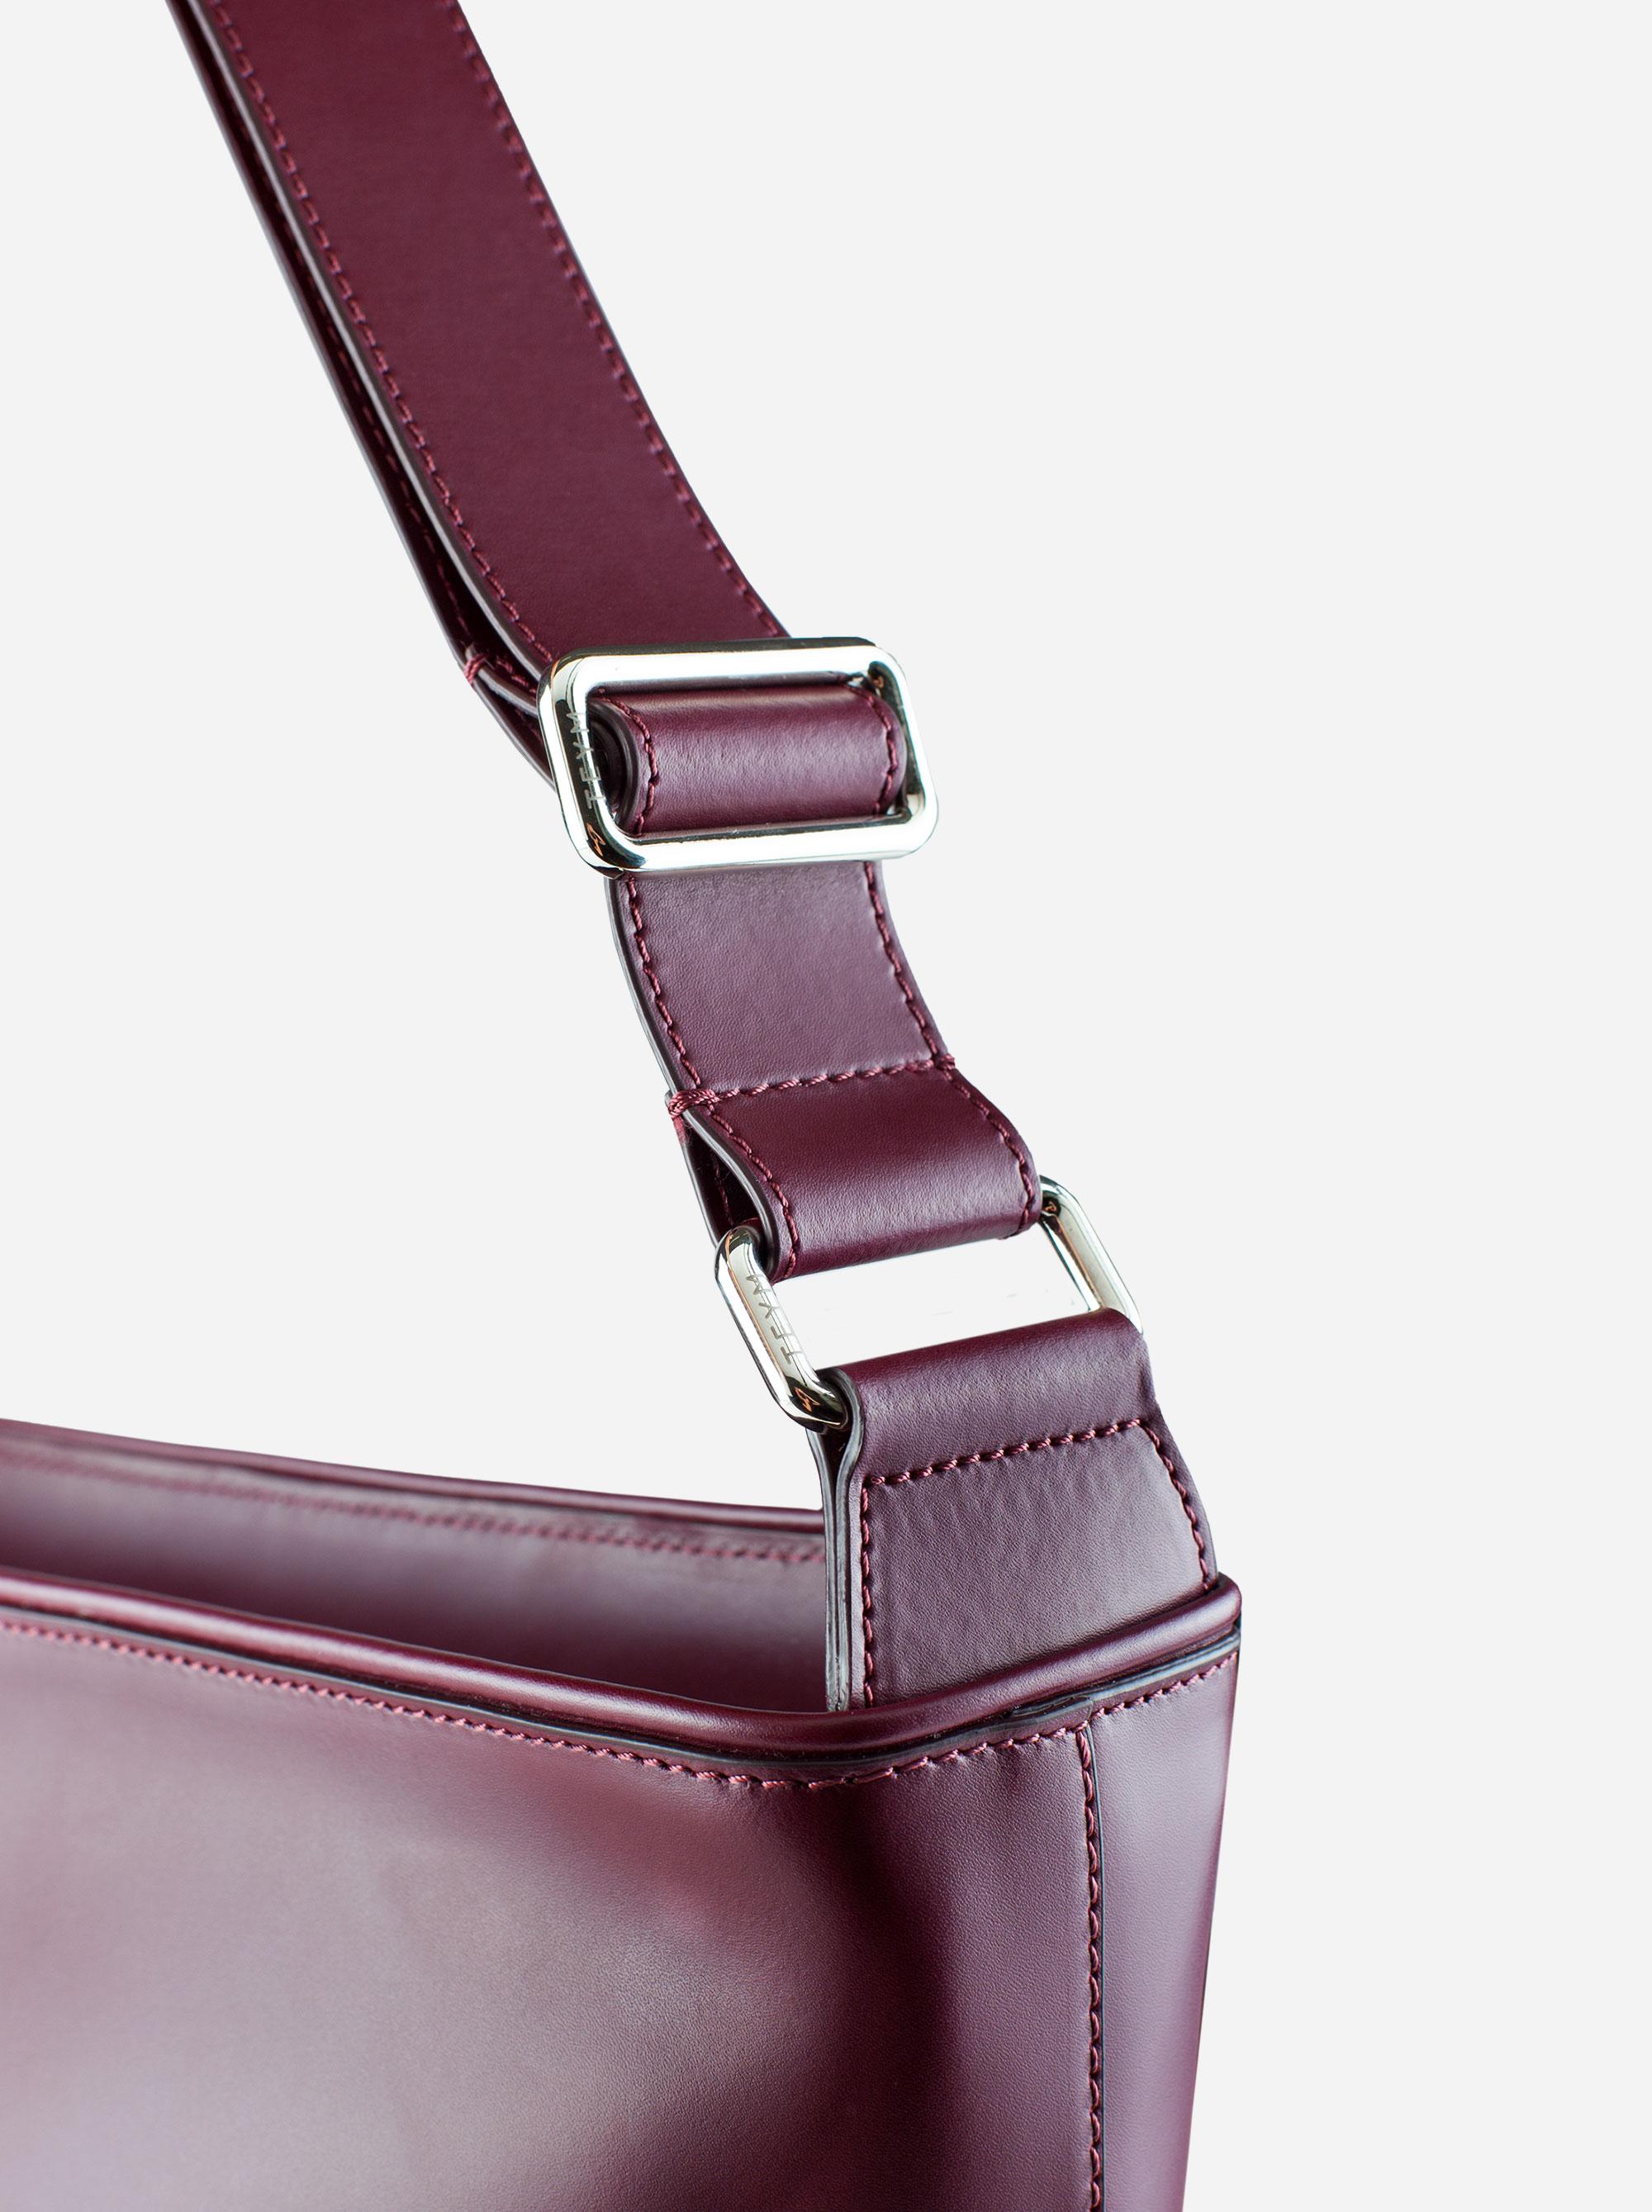 Teym - The Shoulder Bag - Burgundy - 5